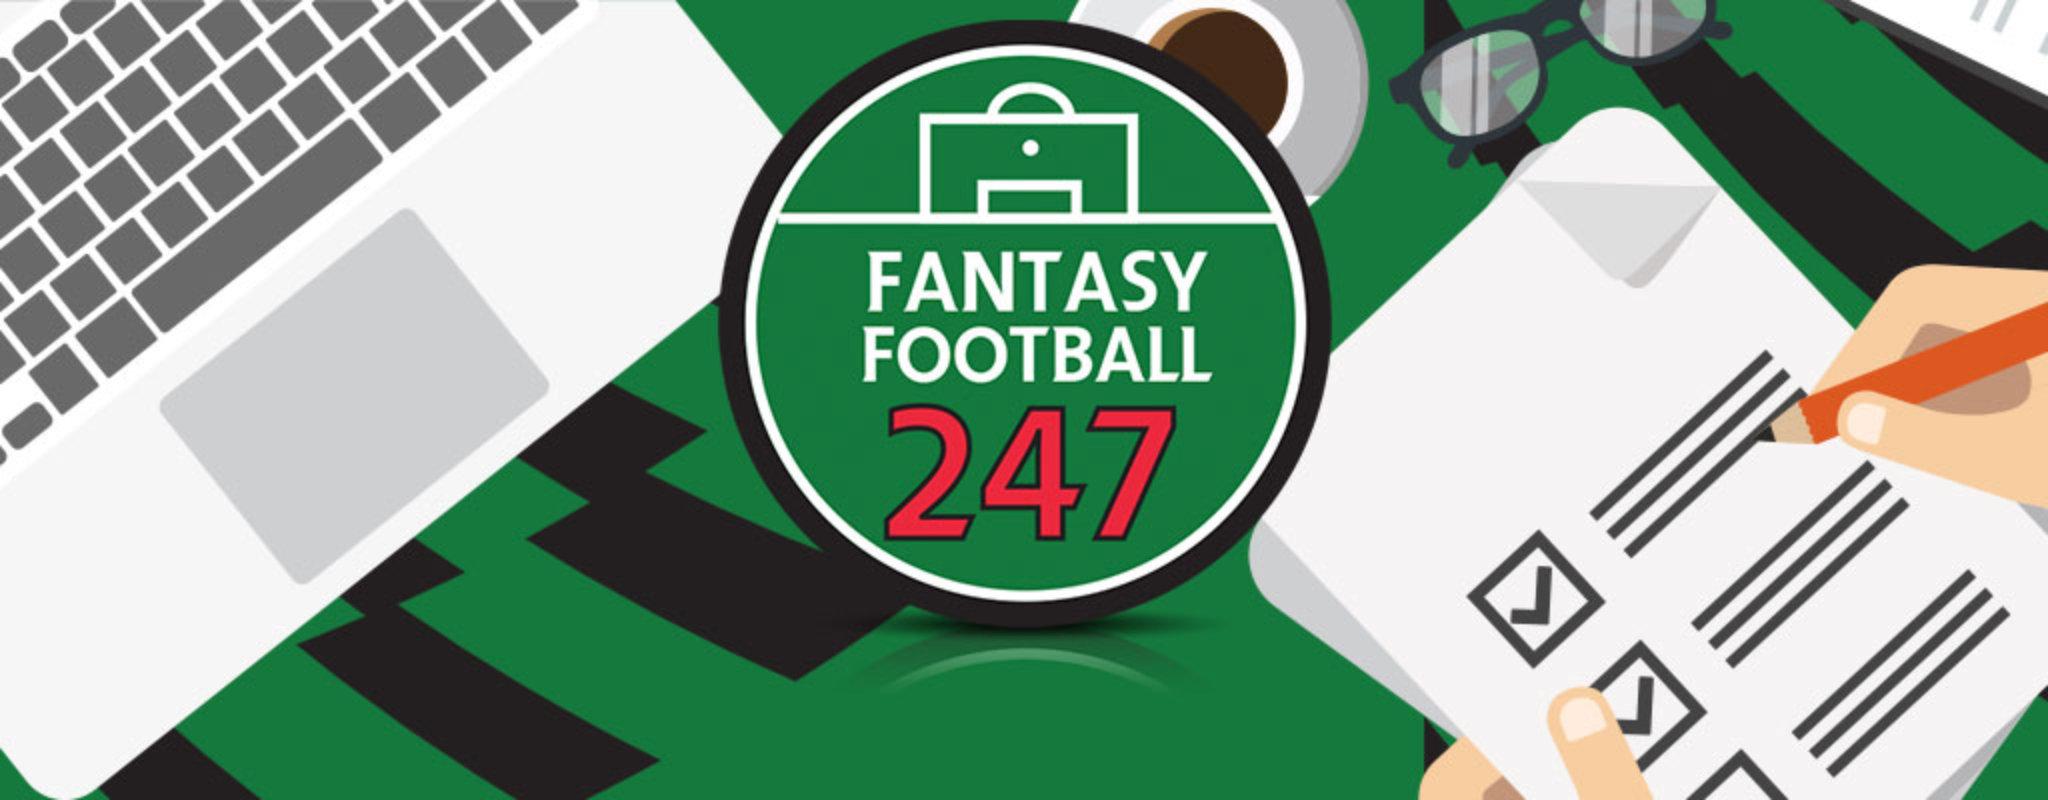 Fantasy Football Tips Gameweek 28 - Fantasy Football 247